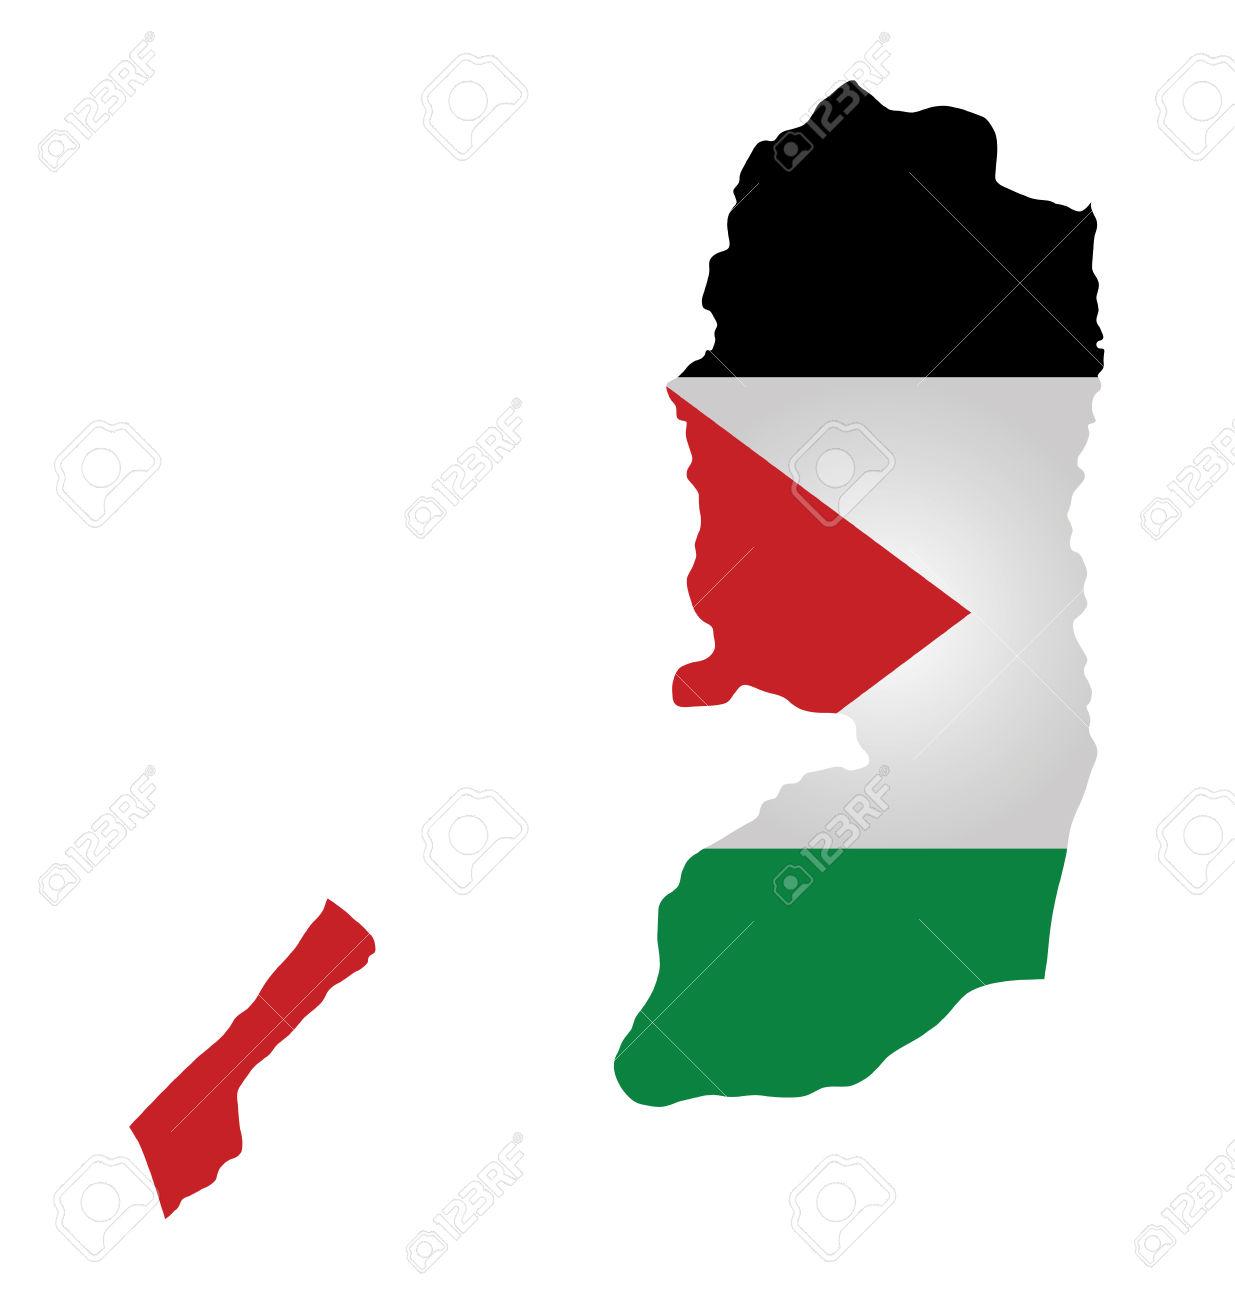 248 Gaza Strip Stock Vector Illustration And Royalty Free Gaza.